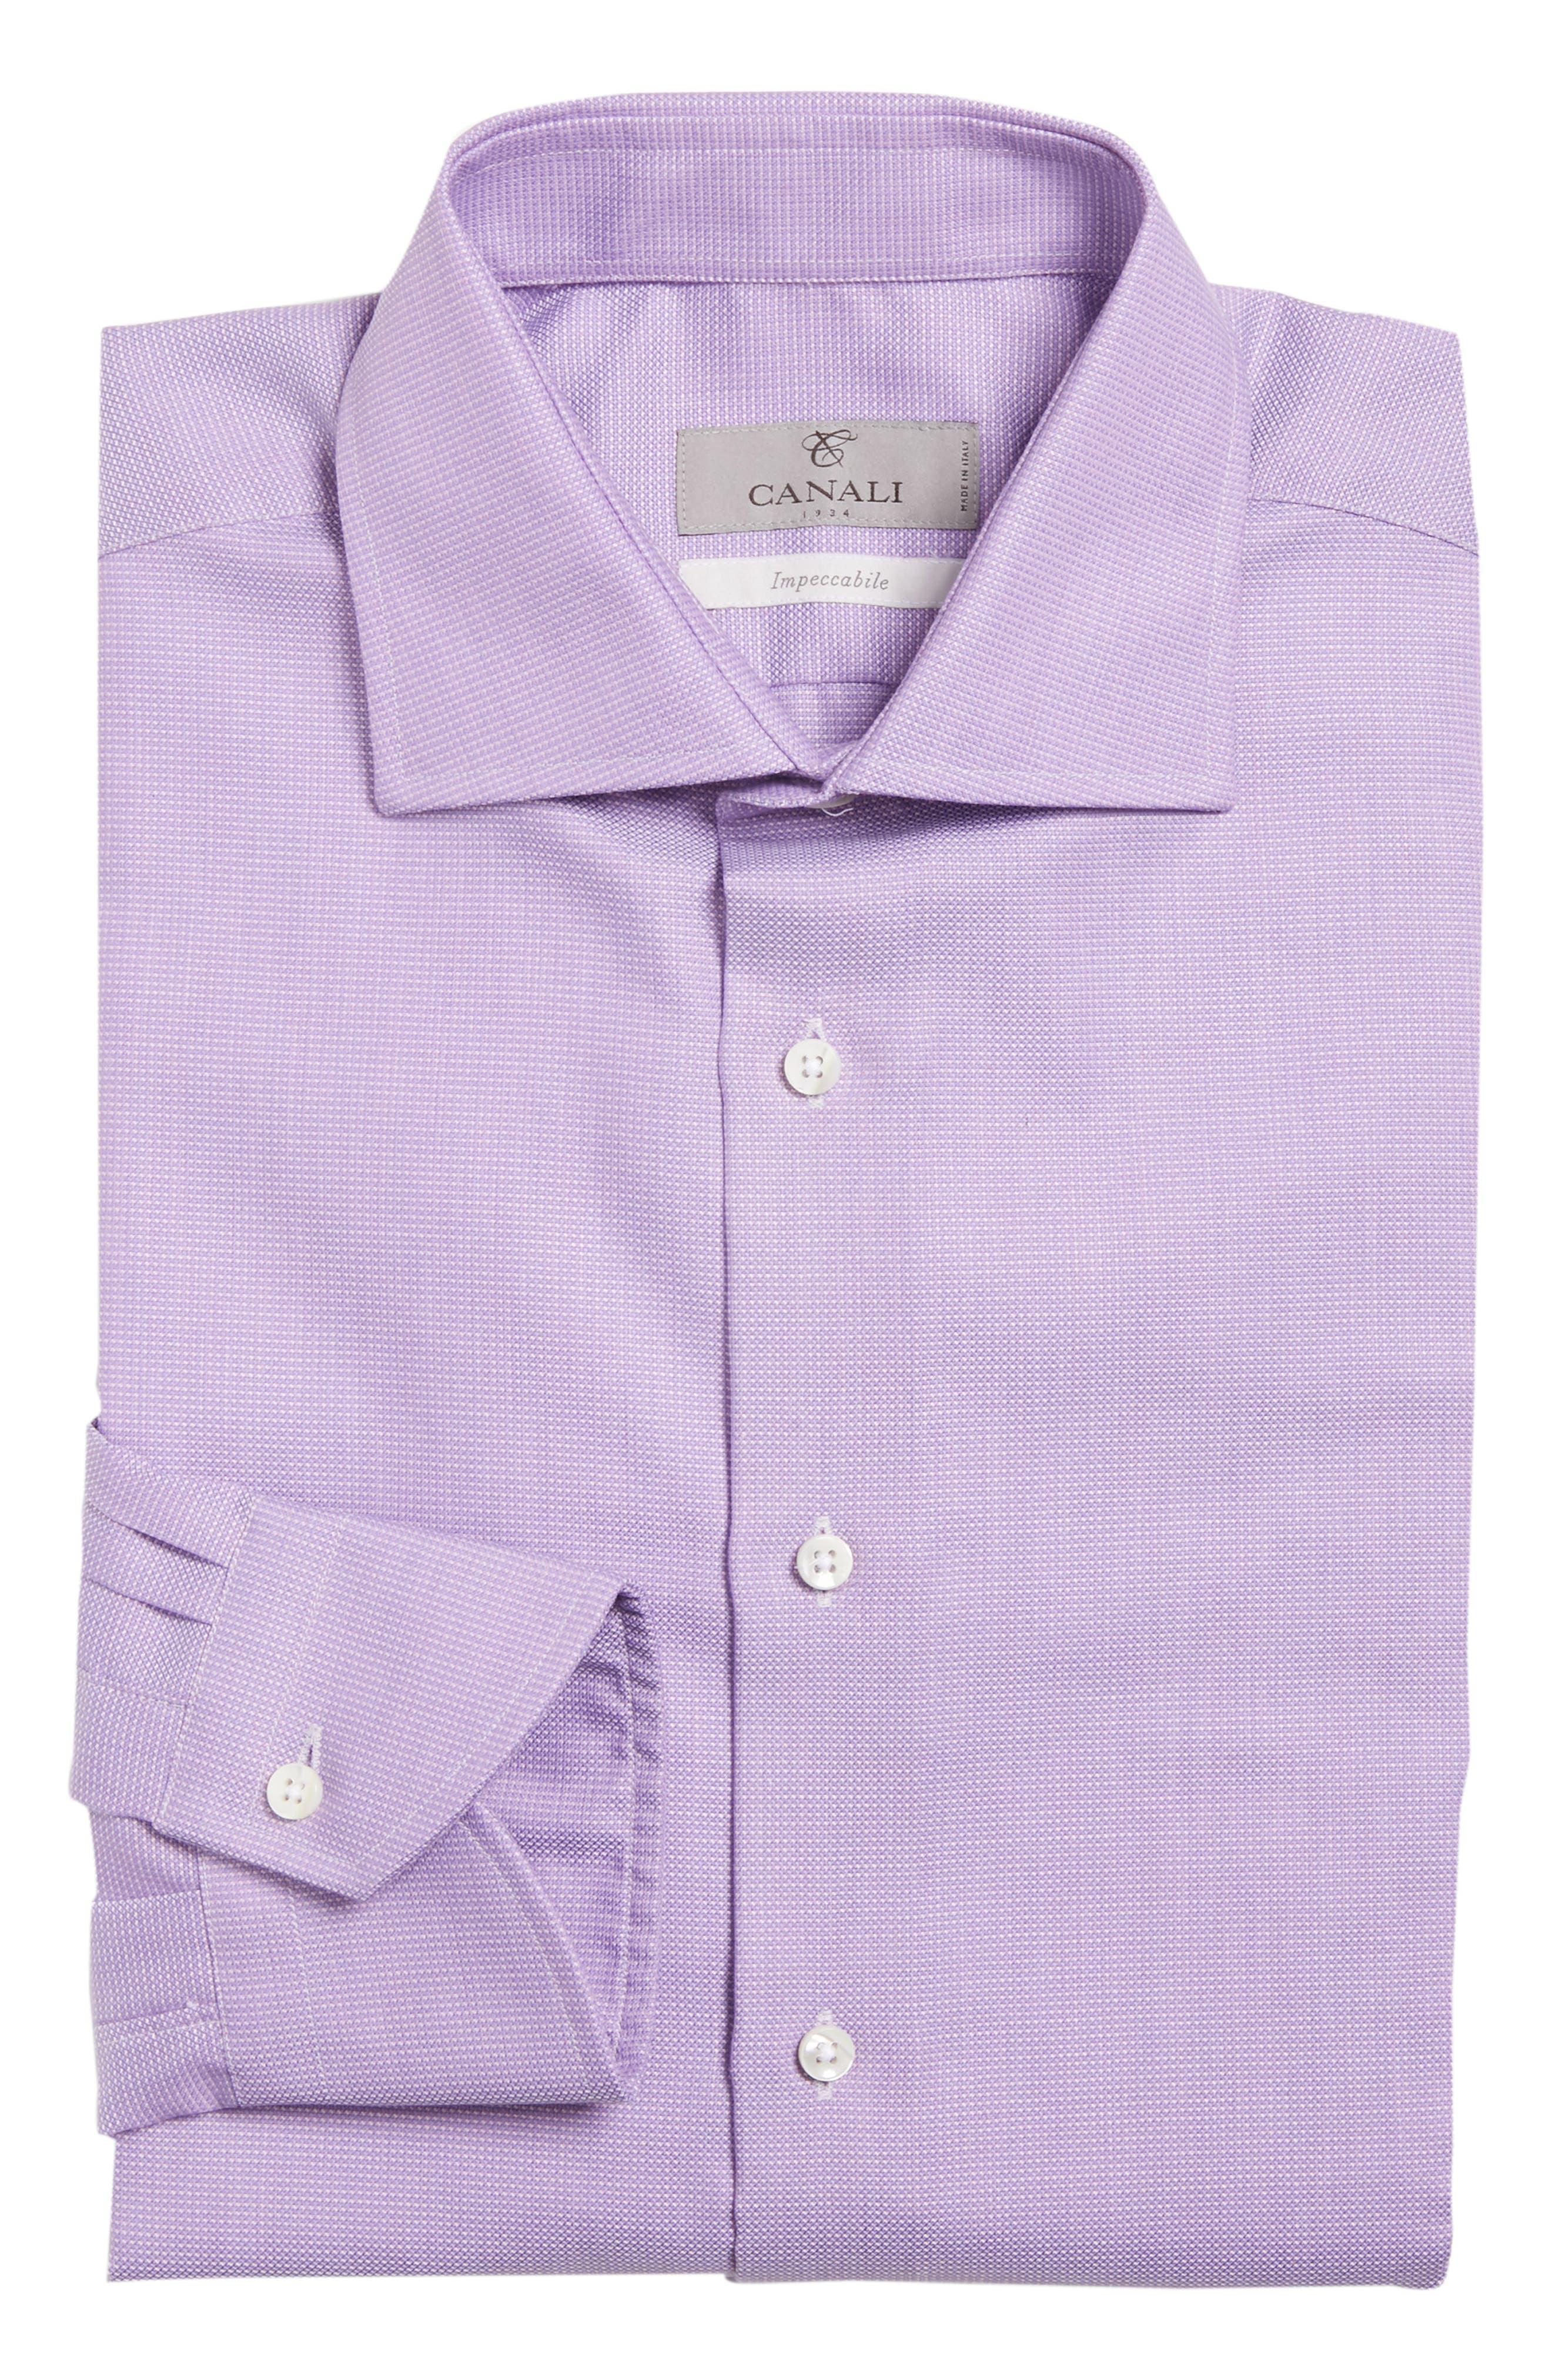 Regular Fit Solid Dress Shirt,                             Alternate thumbnail 5, color,                             520